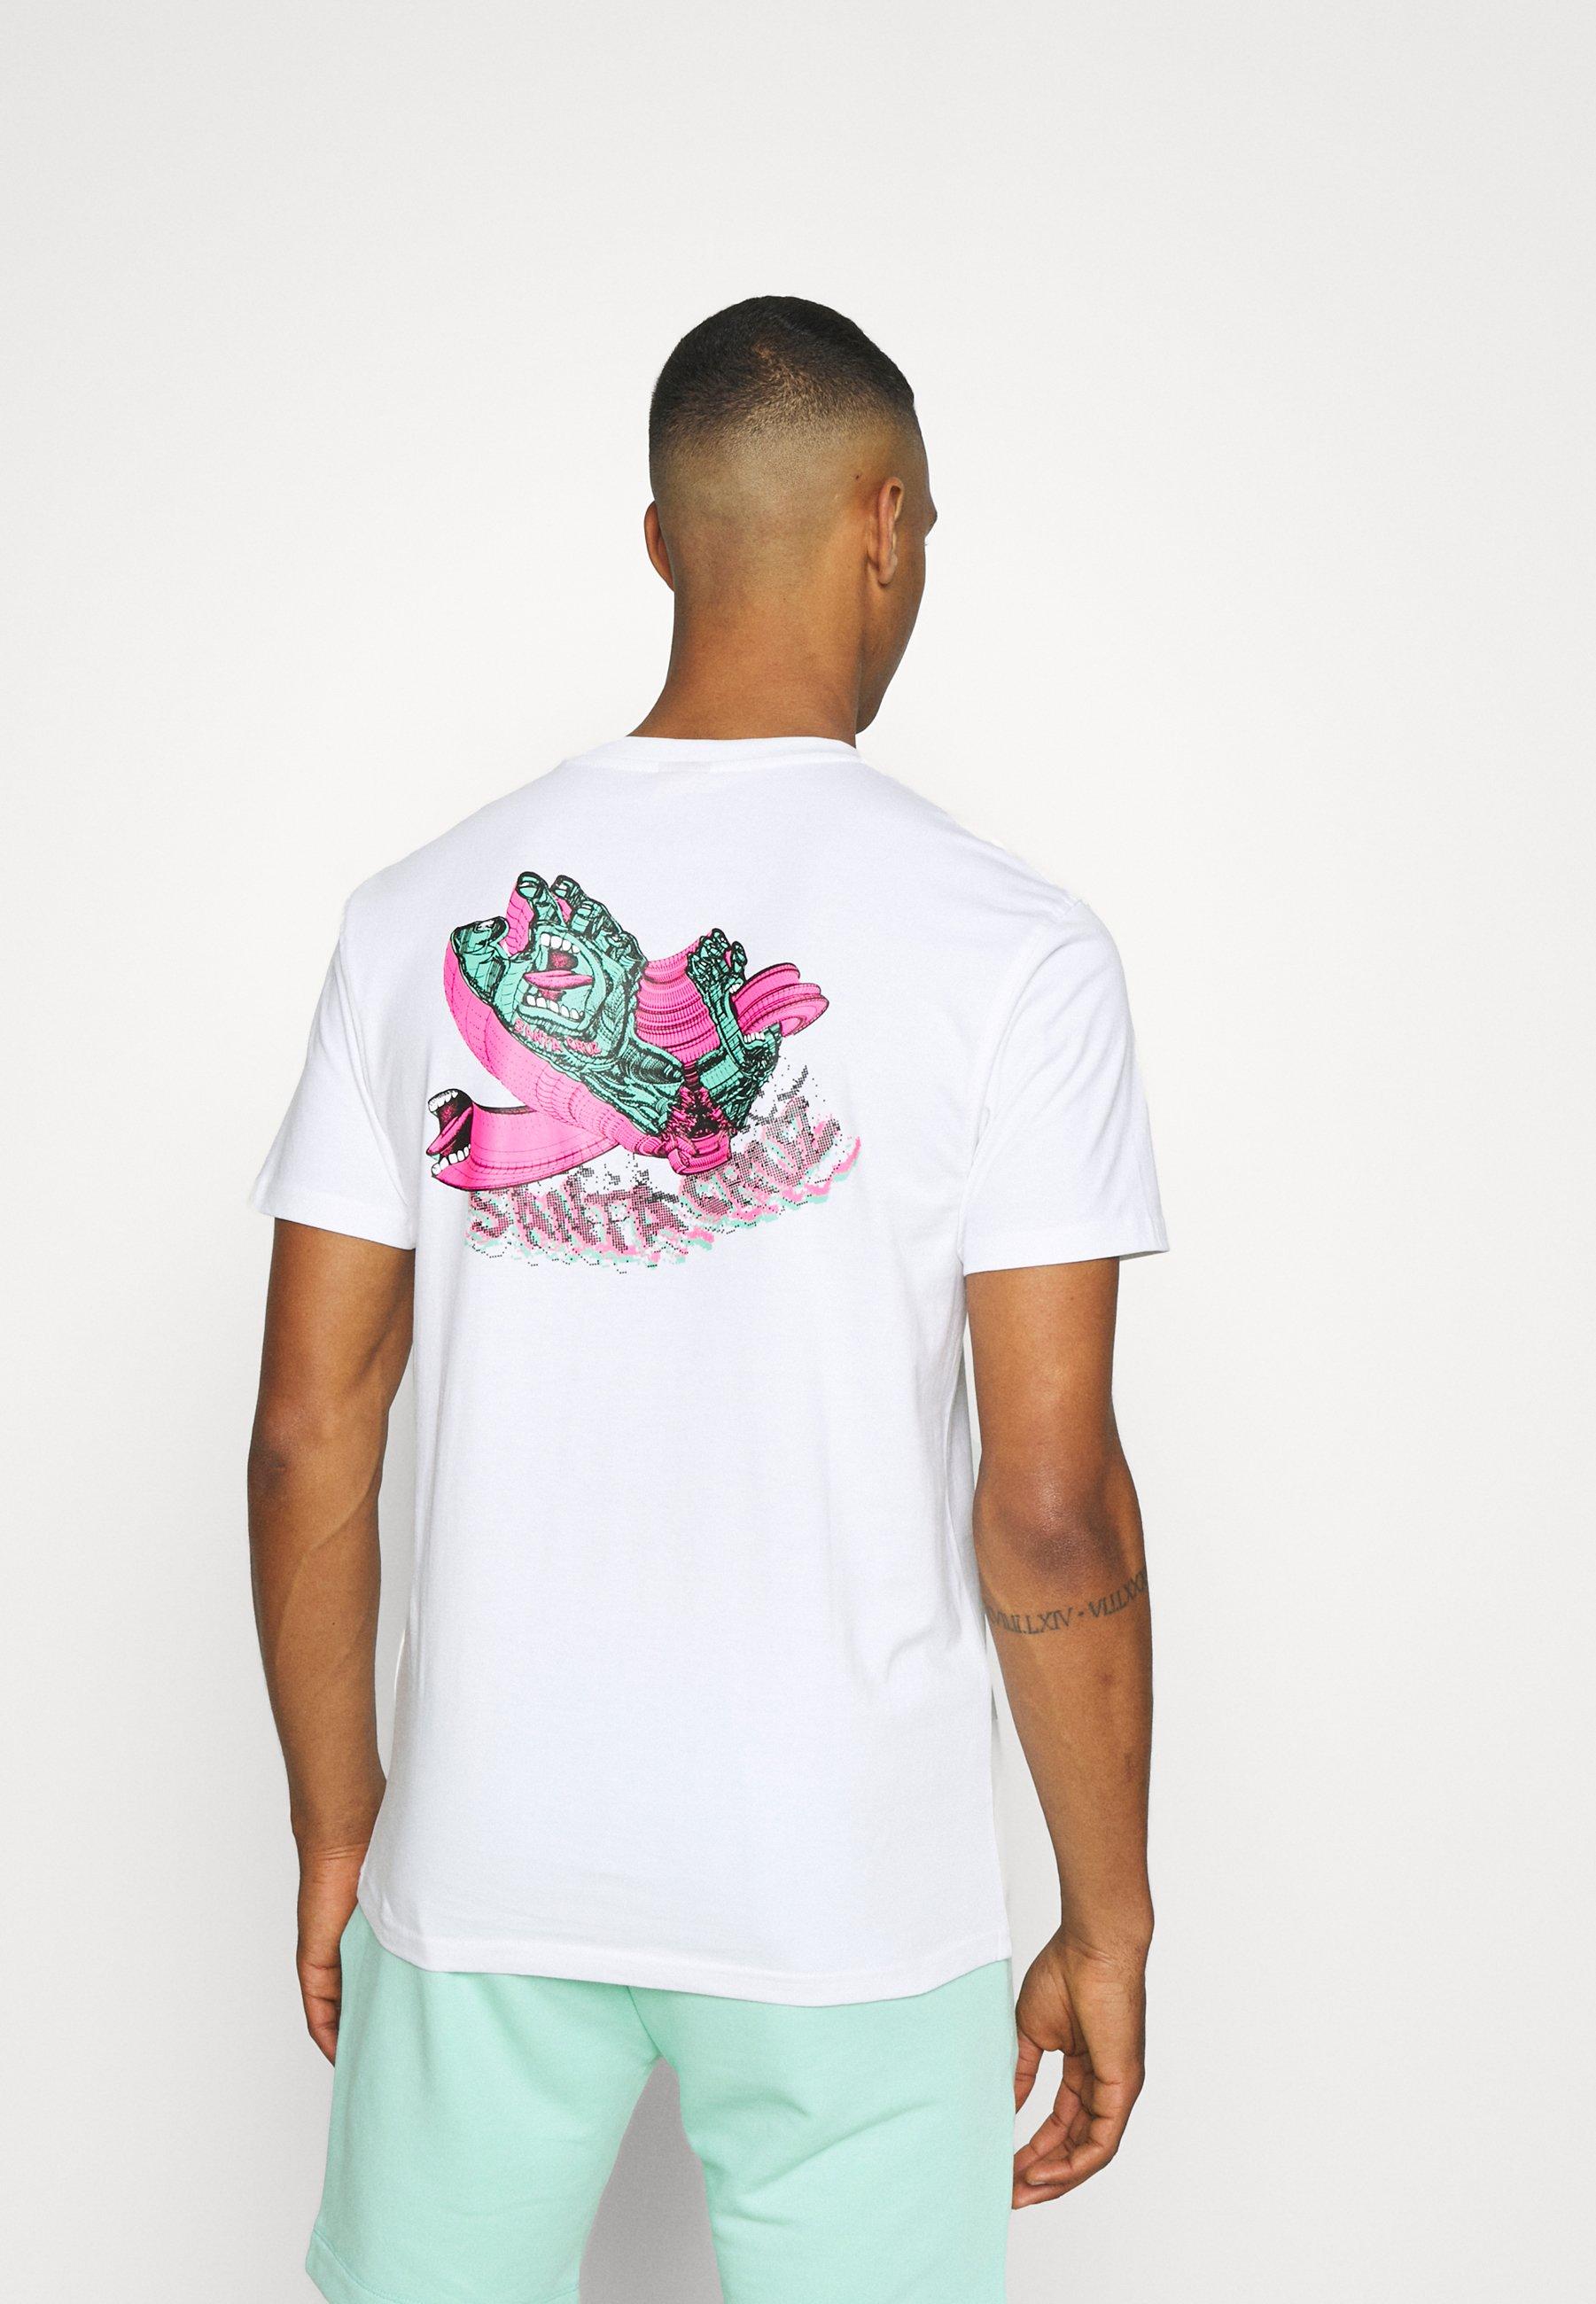 Homme UNISEX NO PATTERN SCREAMING HAND - T-shirt imprimé